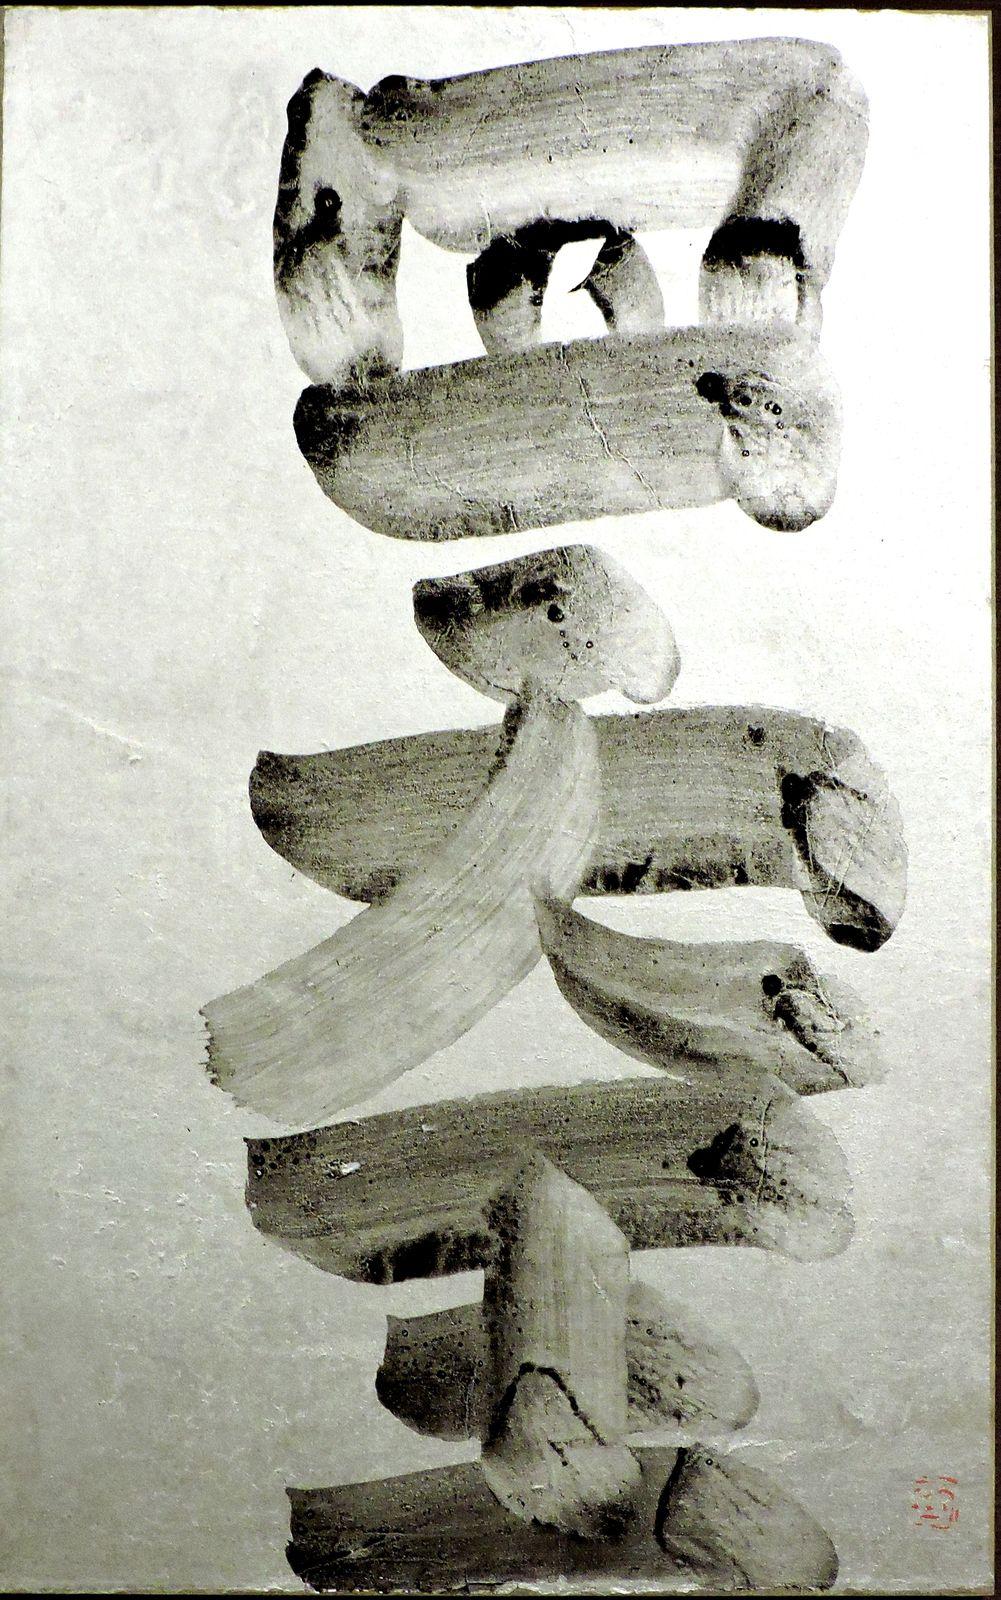 Yu-Ichi Inoue, la calligraphie du corps - 井上有一 , 身体之书法